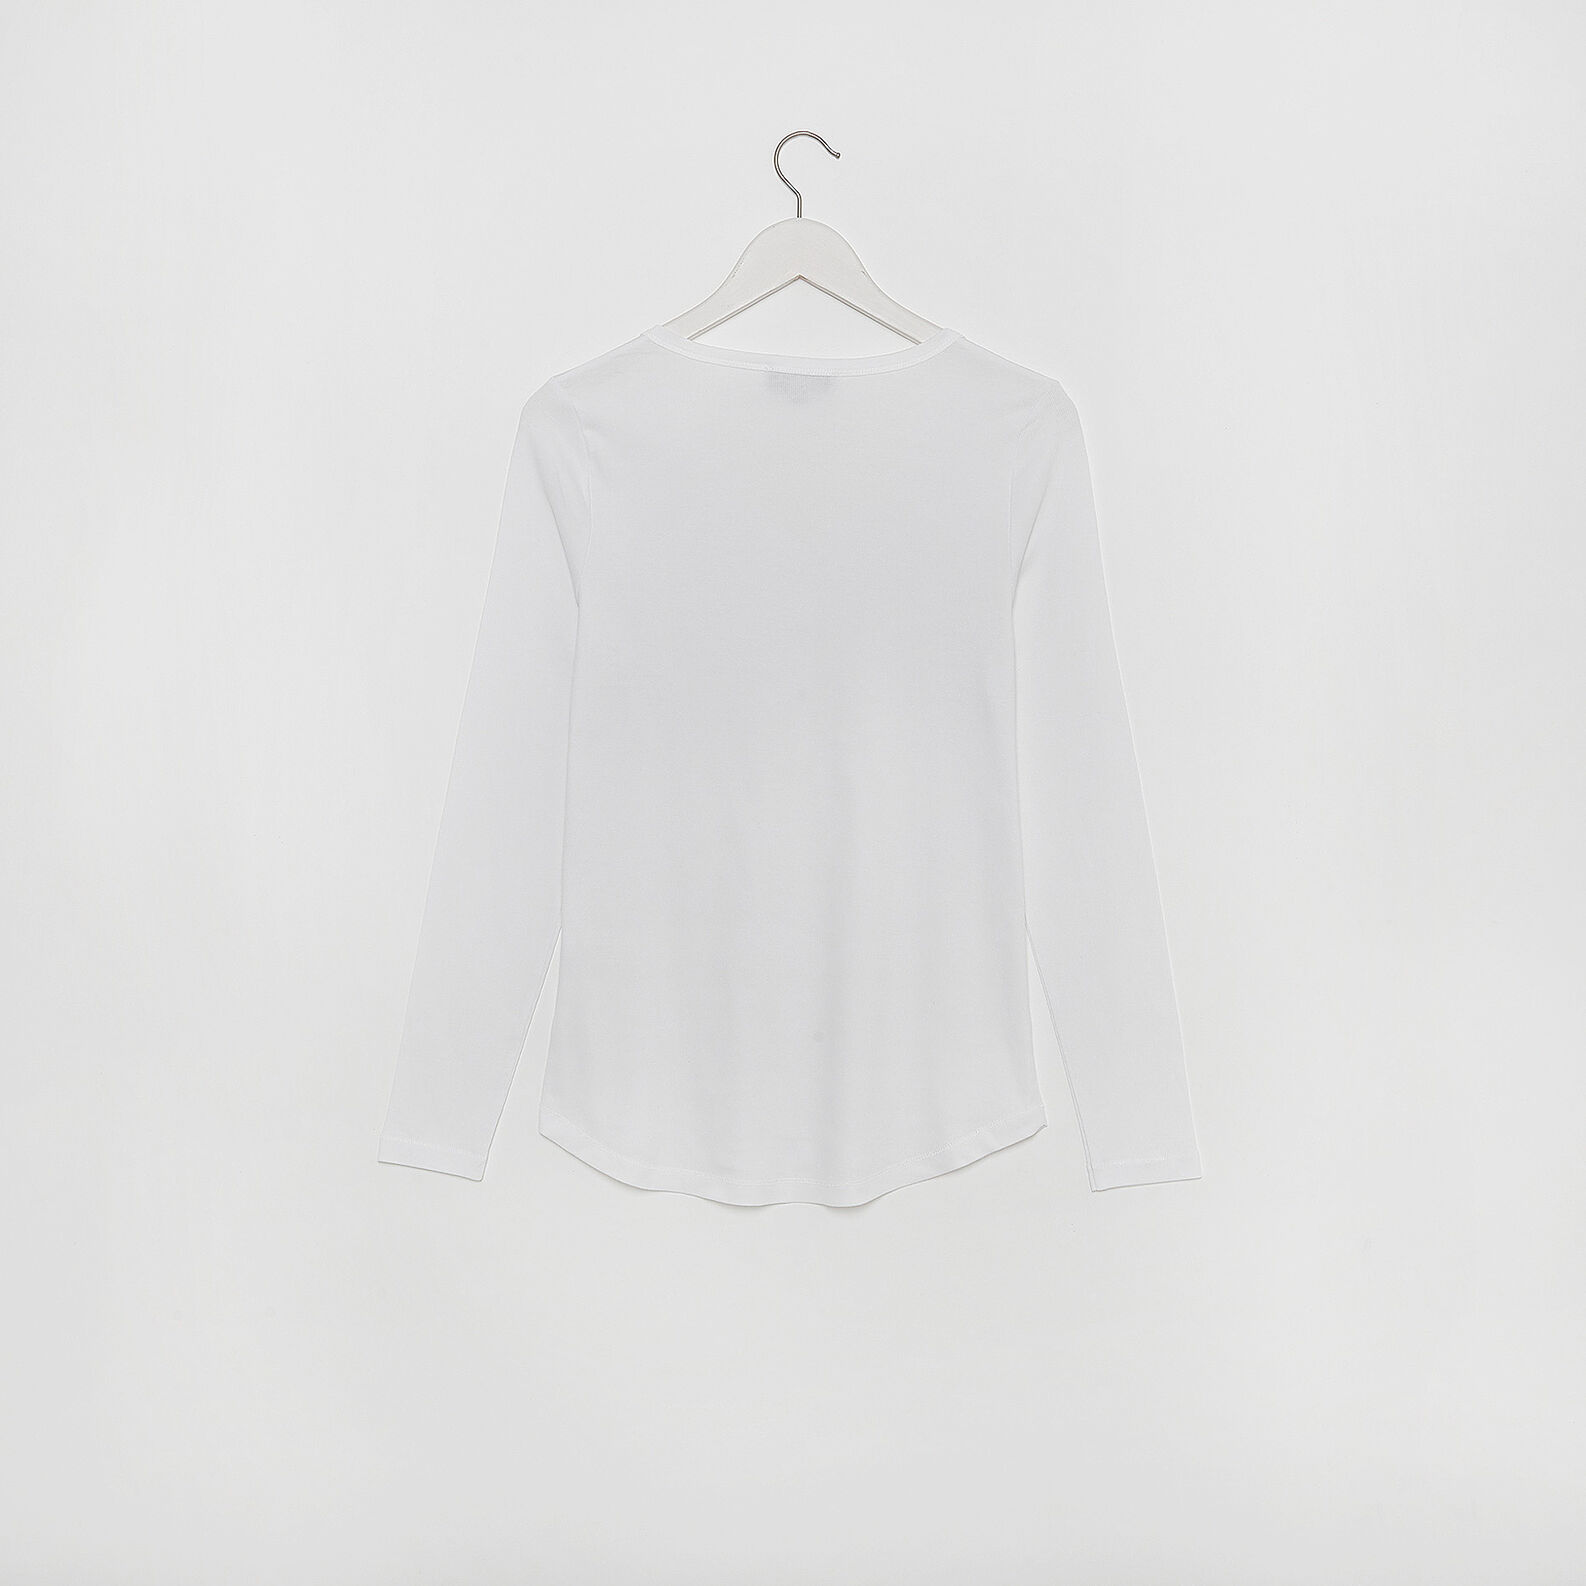 T-shirt in jersey di viscosa tinta unita